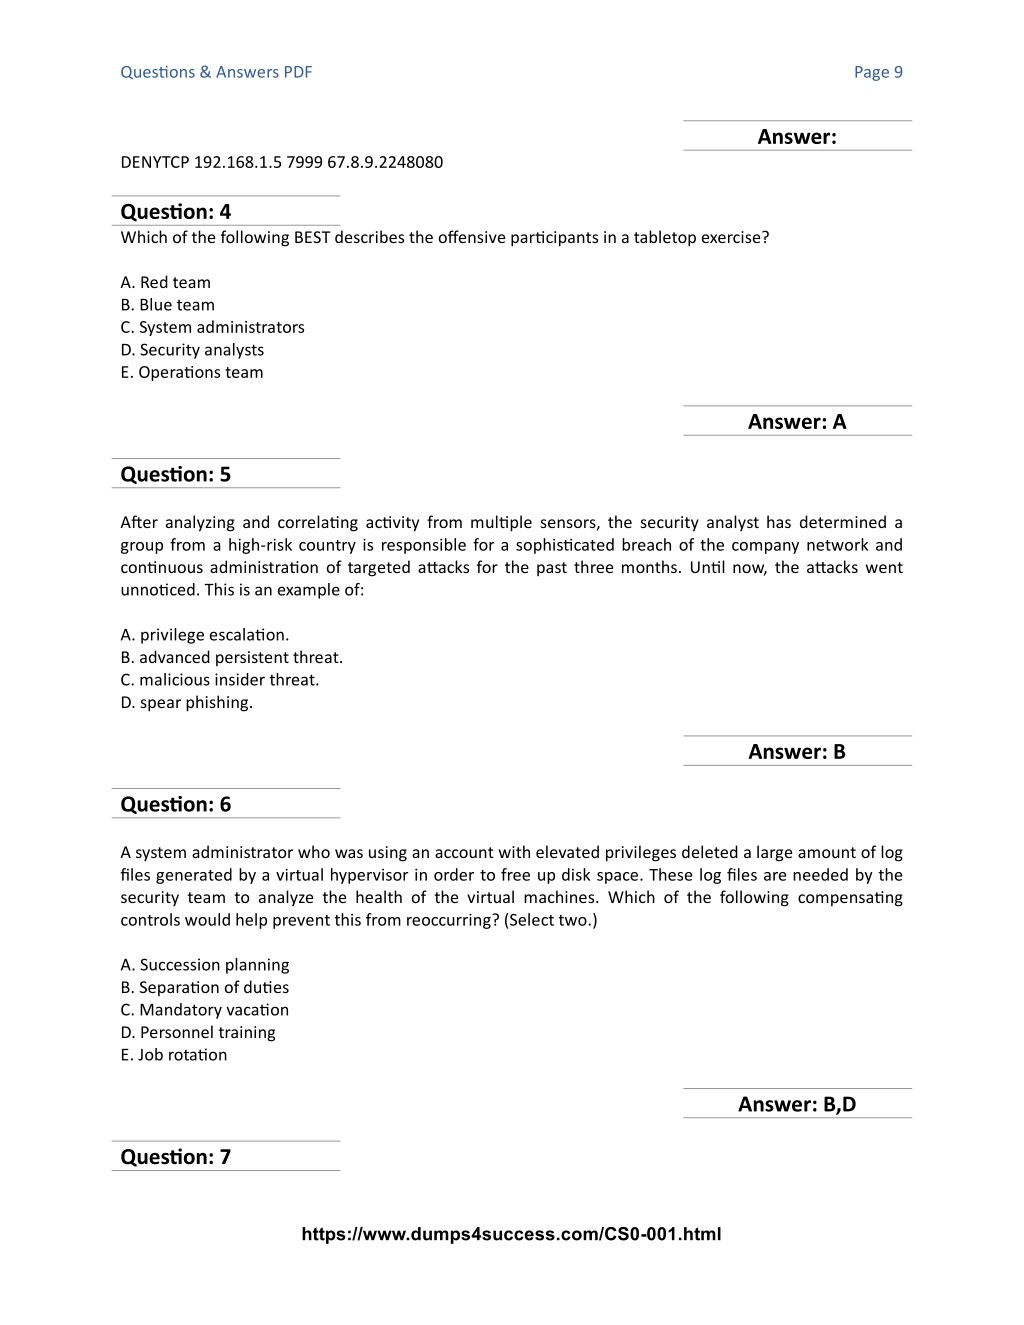 PPT - CySA CS0-001 Dumps Questions - CompTIA Cyber Security